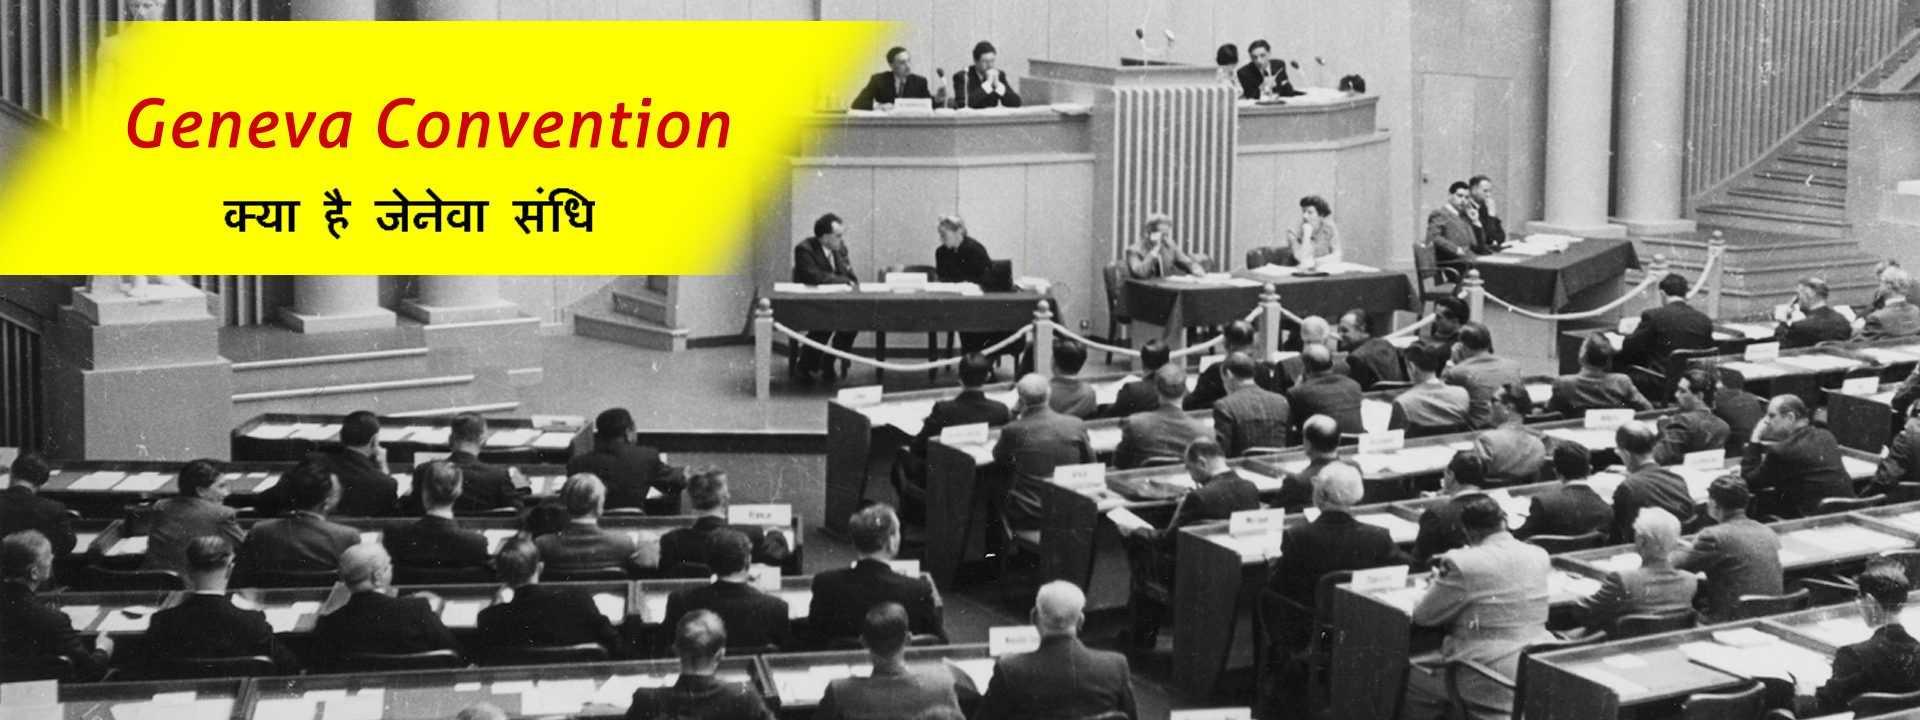 Pakistan abide by Geneva Convention